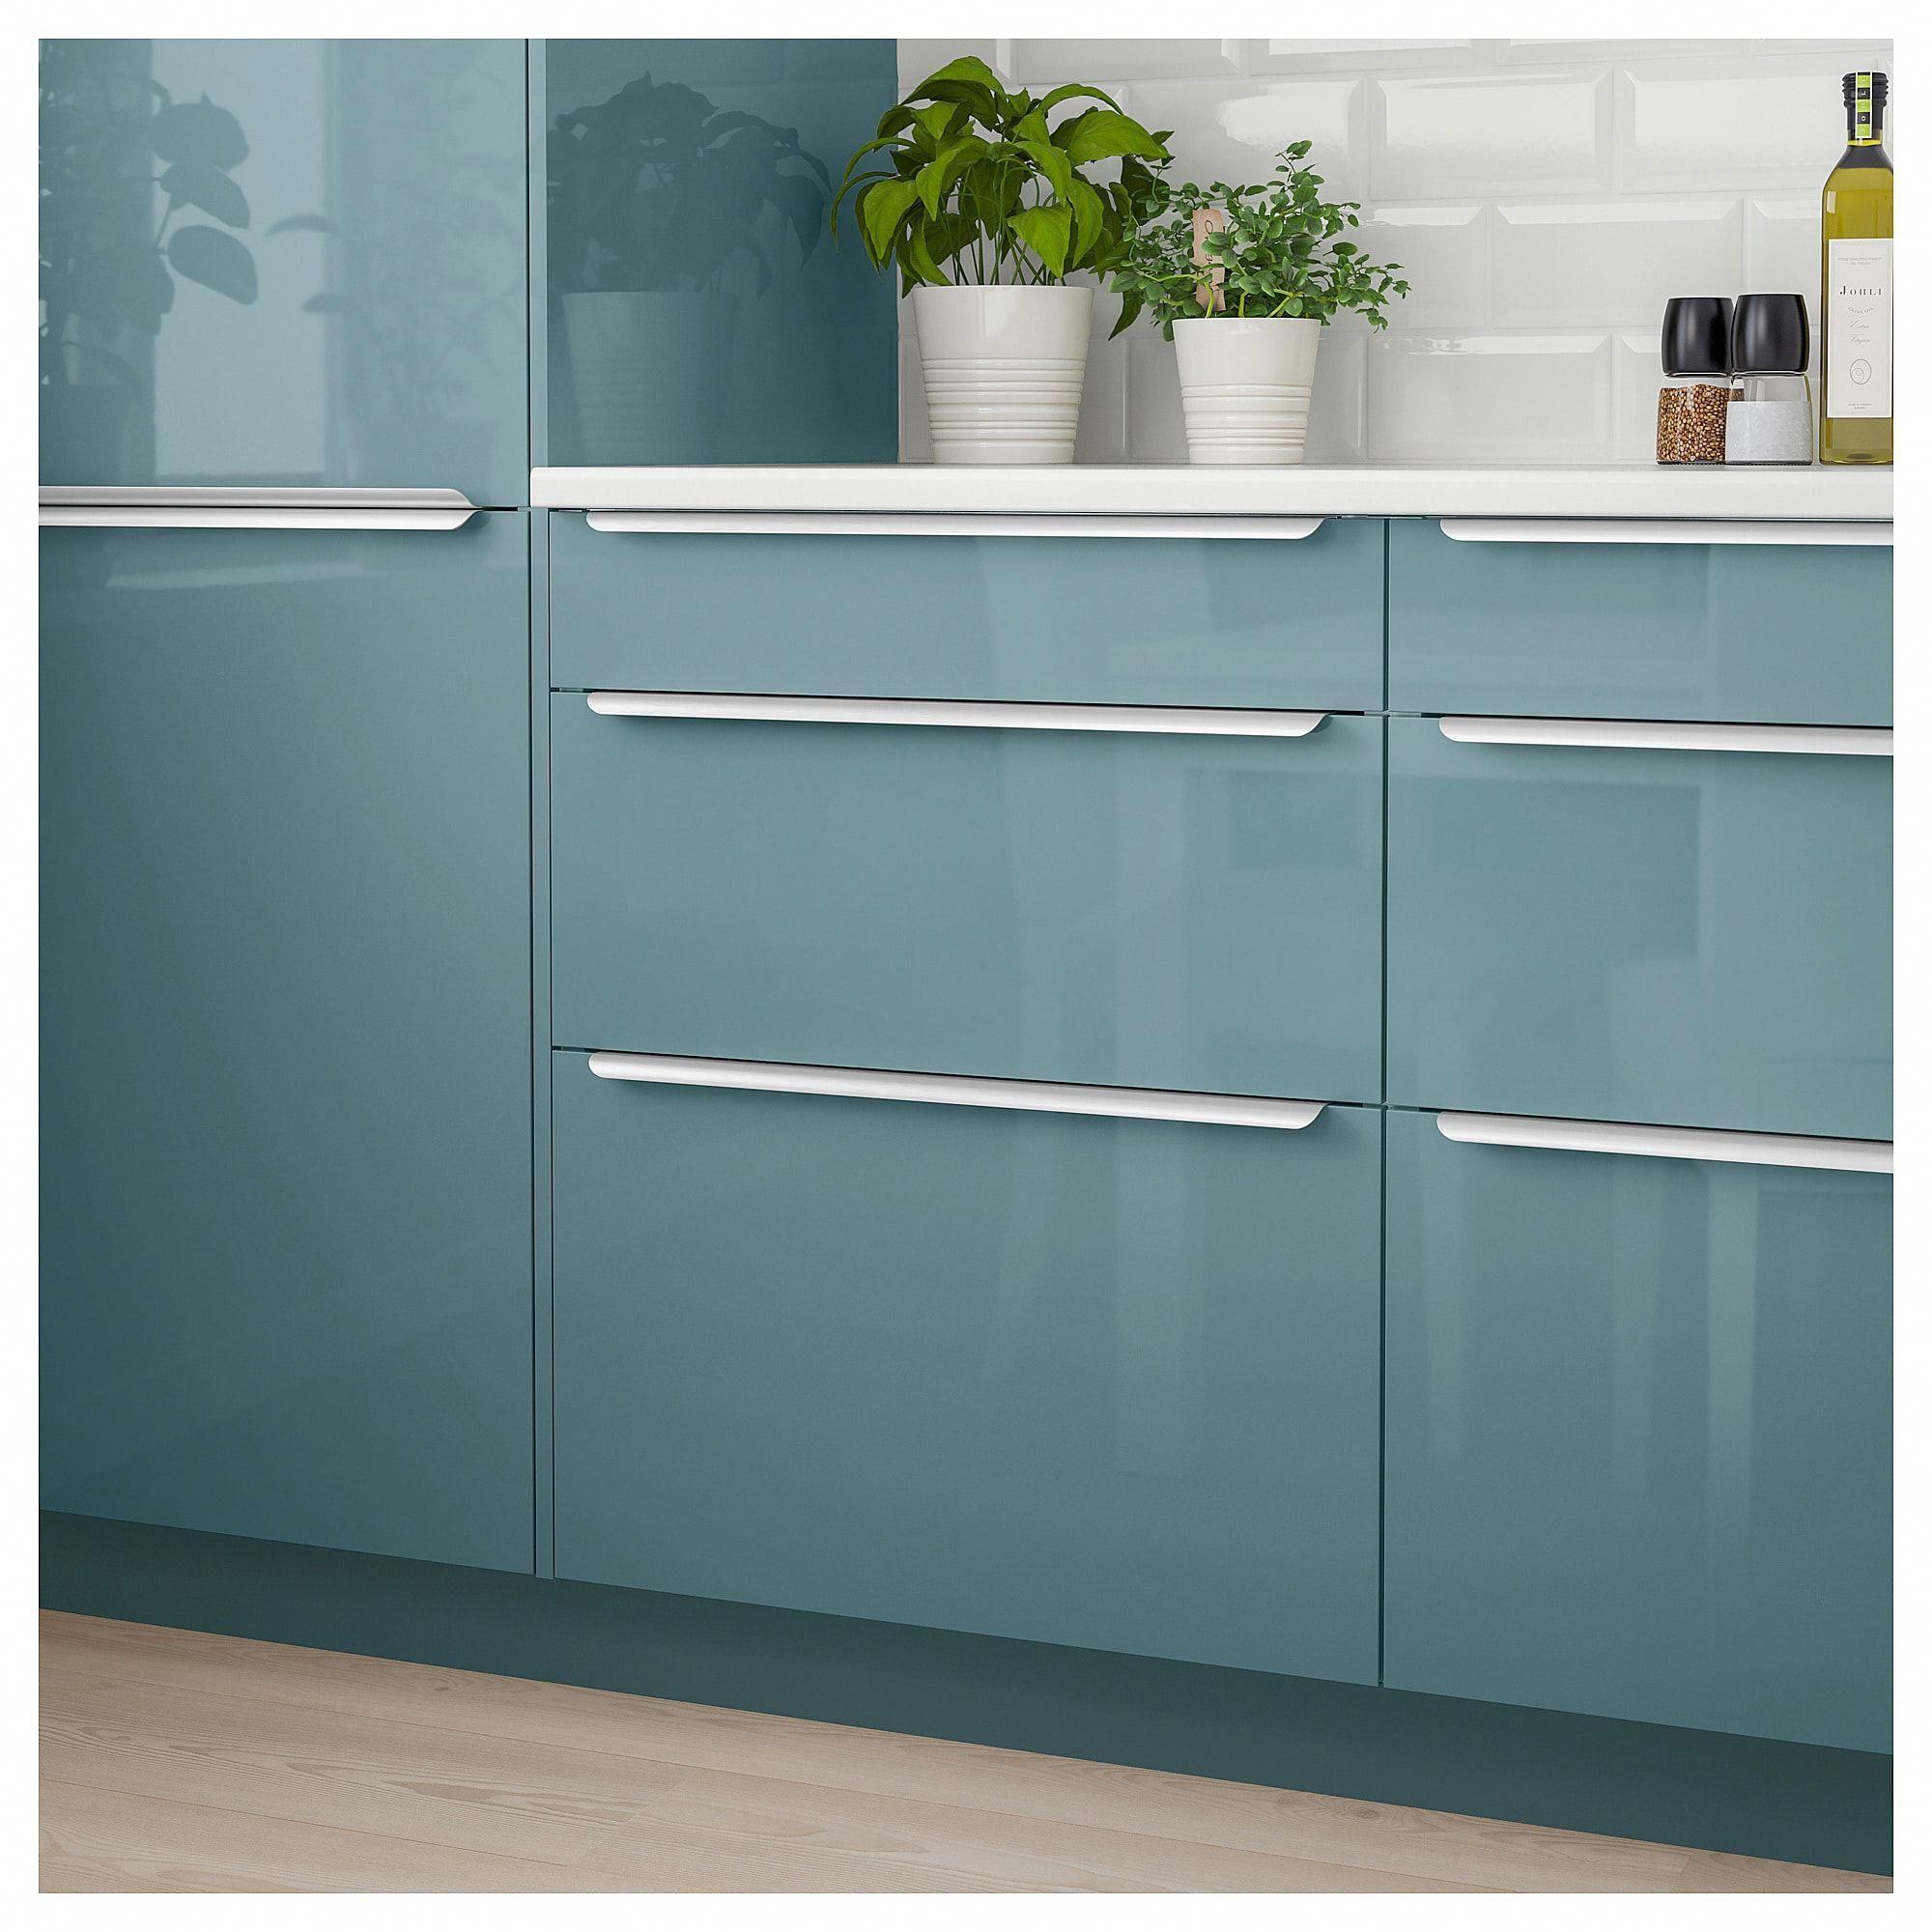 Best Kallarp Drawer Front High Gloss Gray Turquoise Kitchen 400 x 300